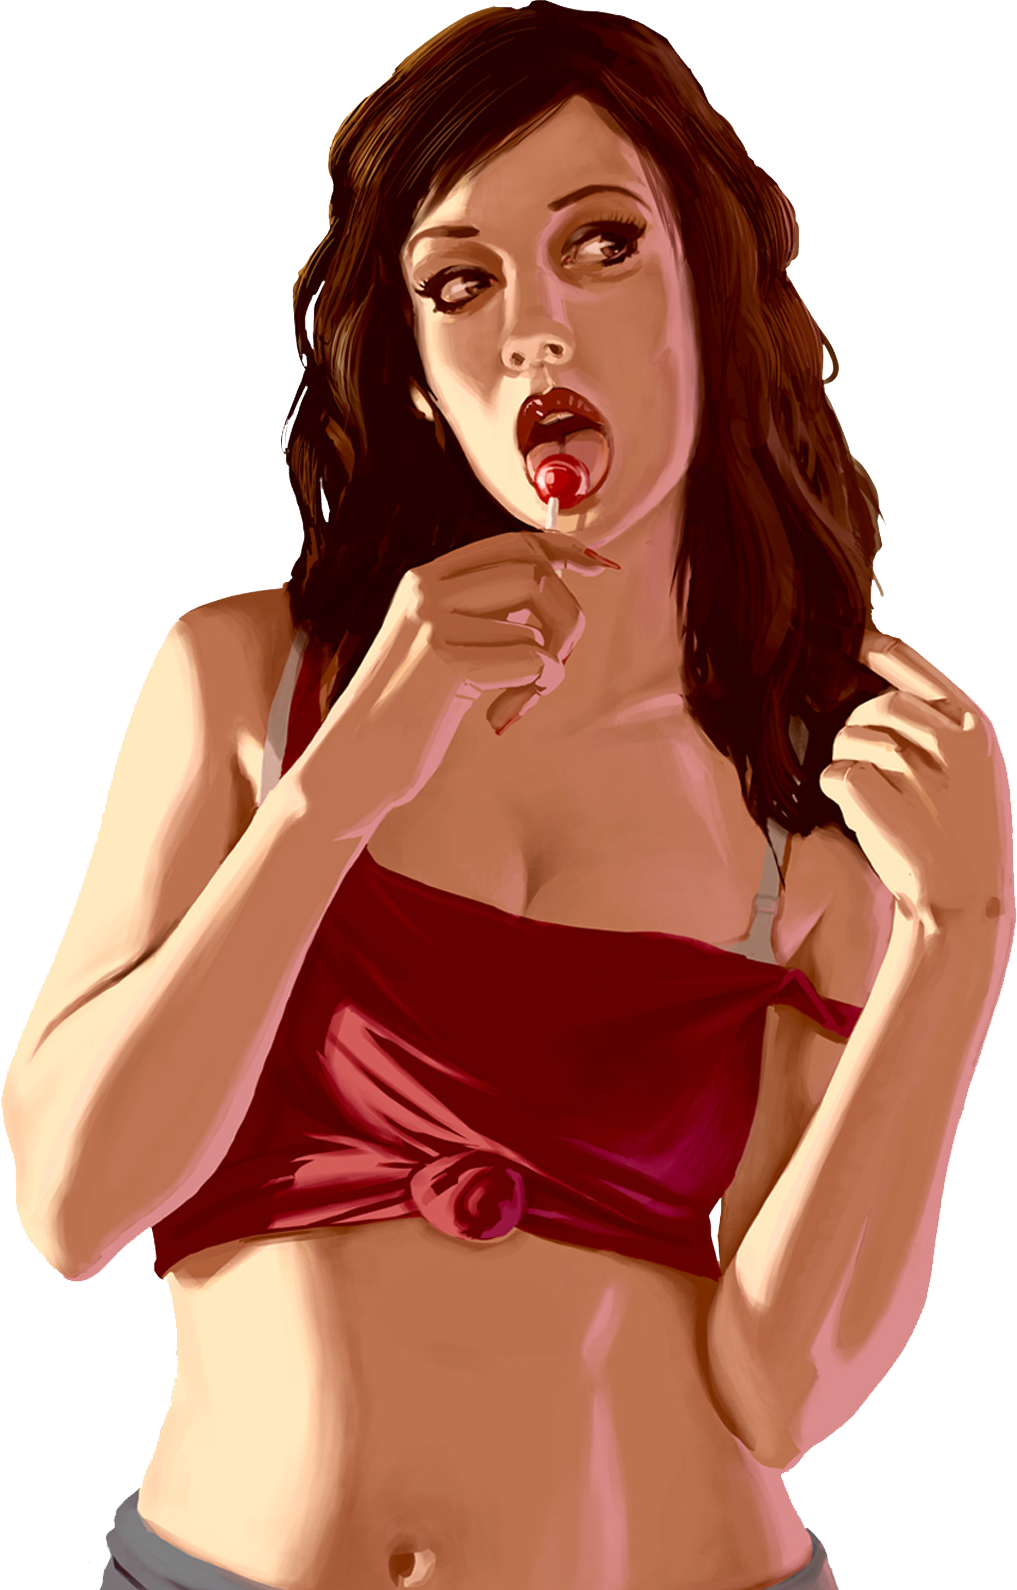 wie kann man in gta san andreas prostituierte frau geschlechtsverkehr